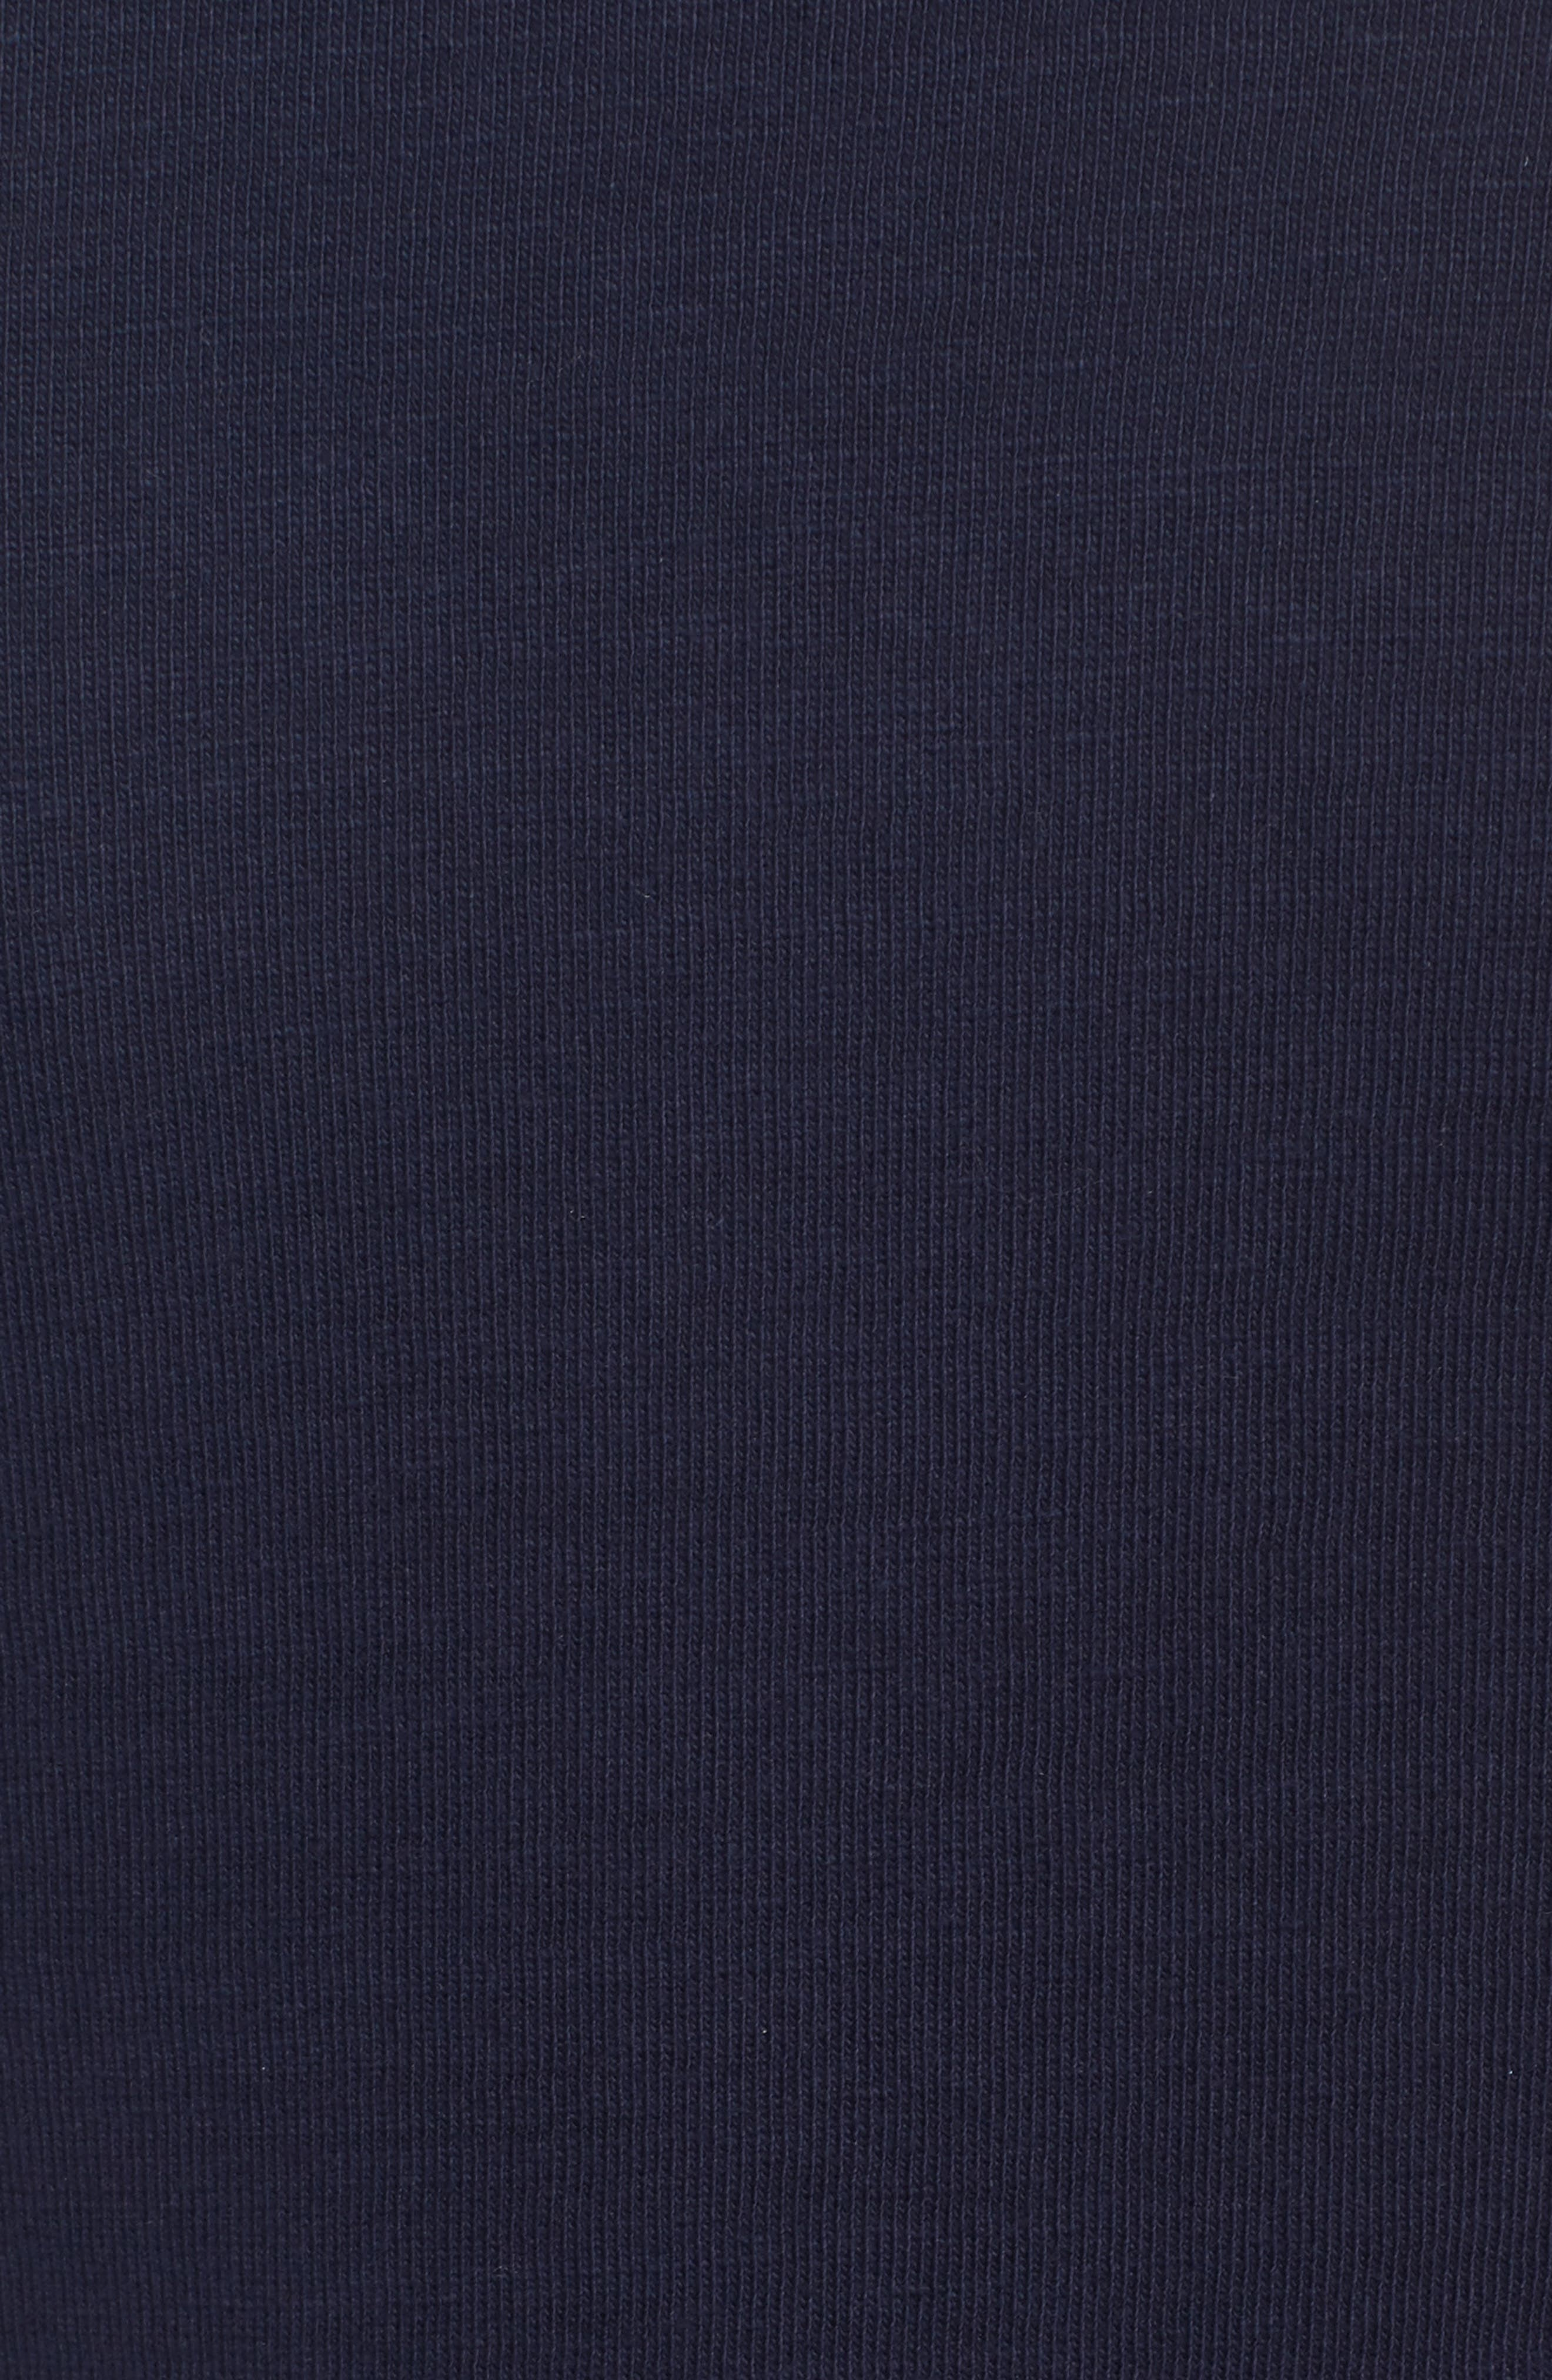 Knit One-Button Blazer,                             Alternate thumbnail 103, color,